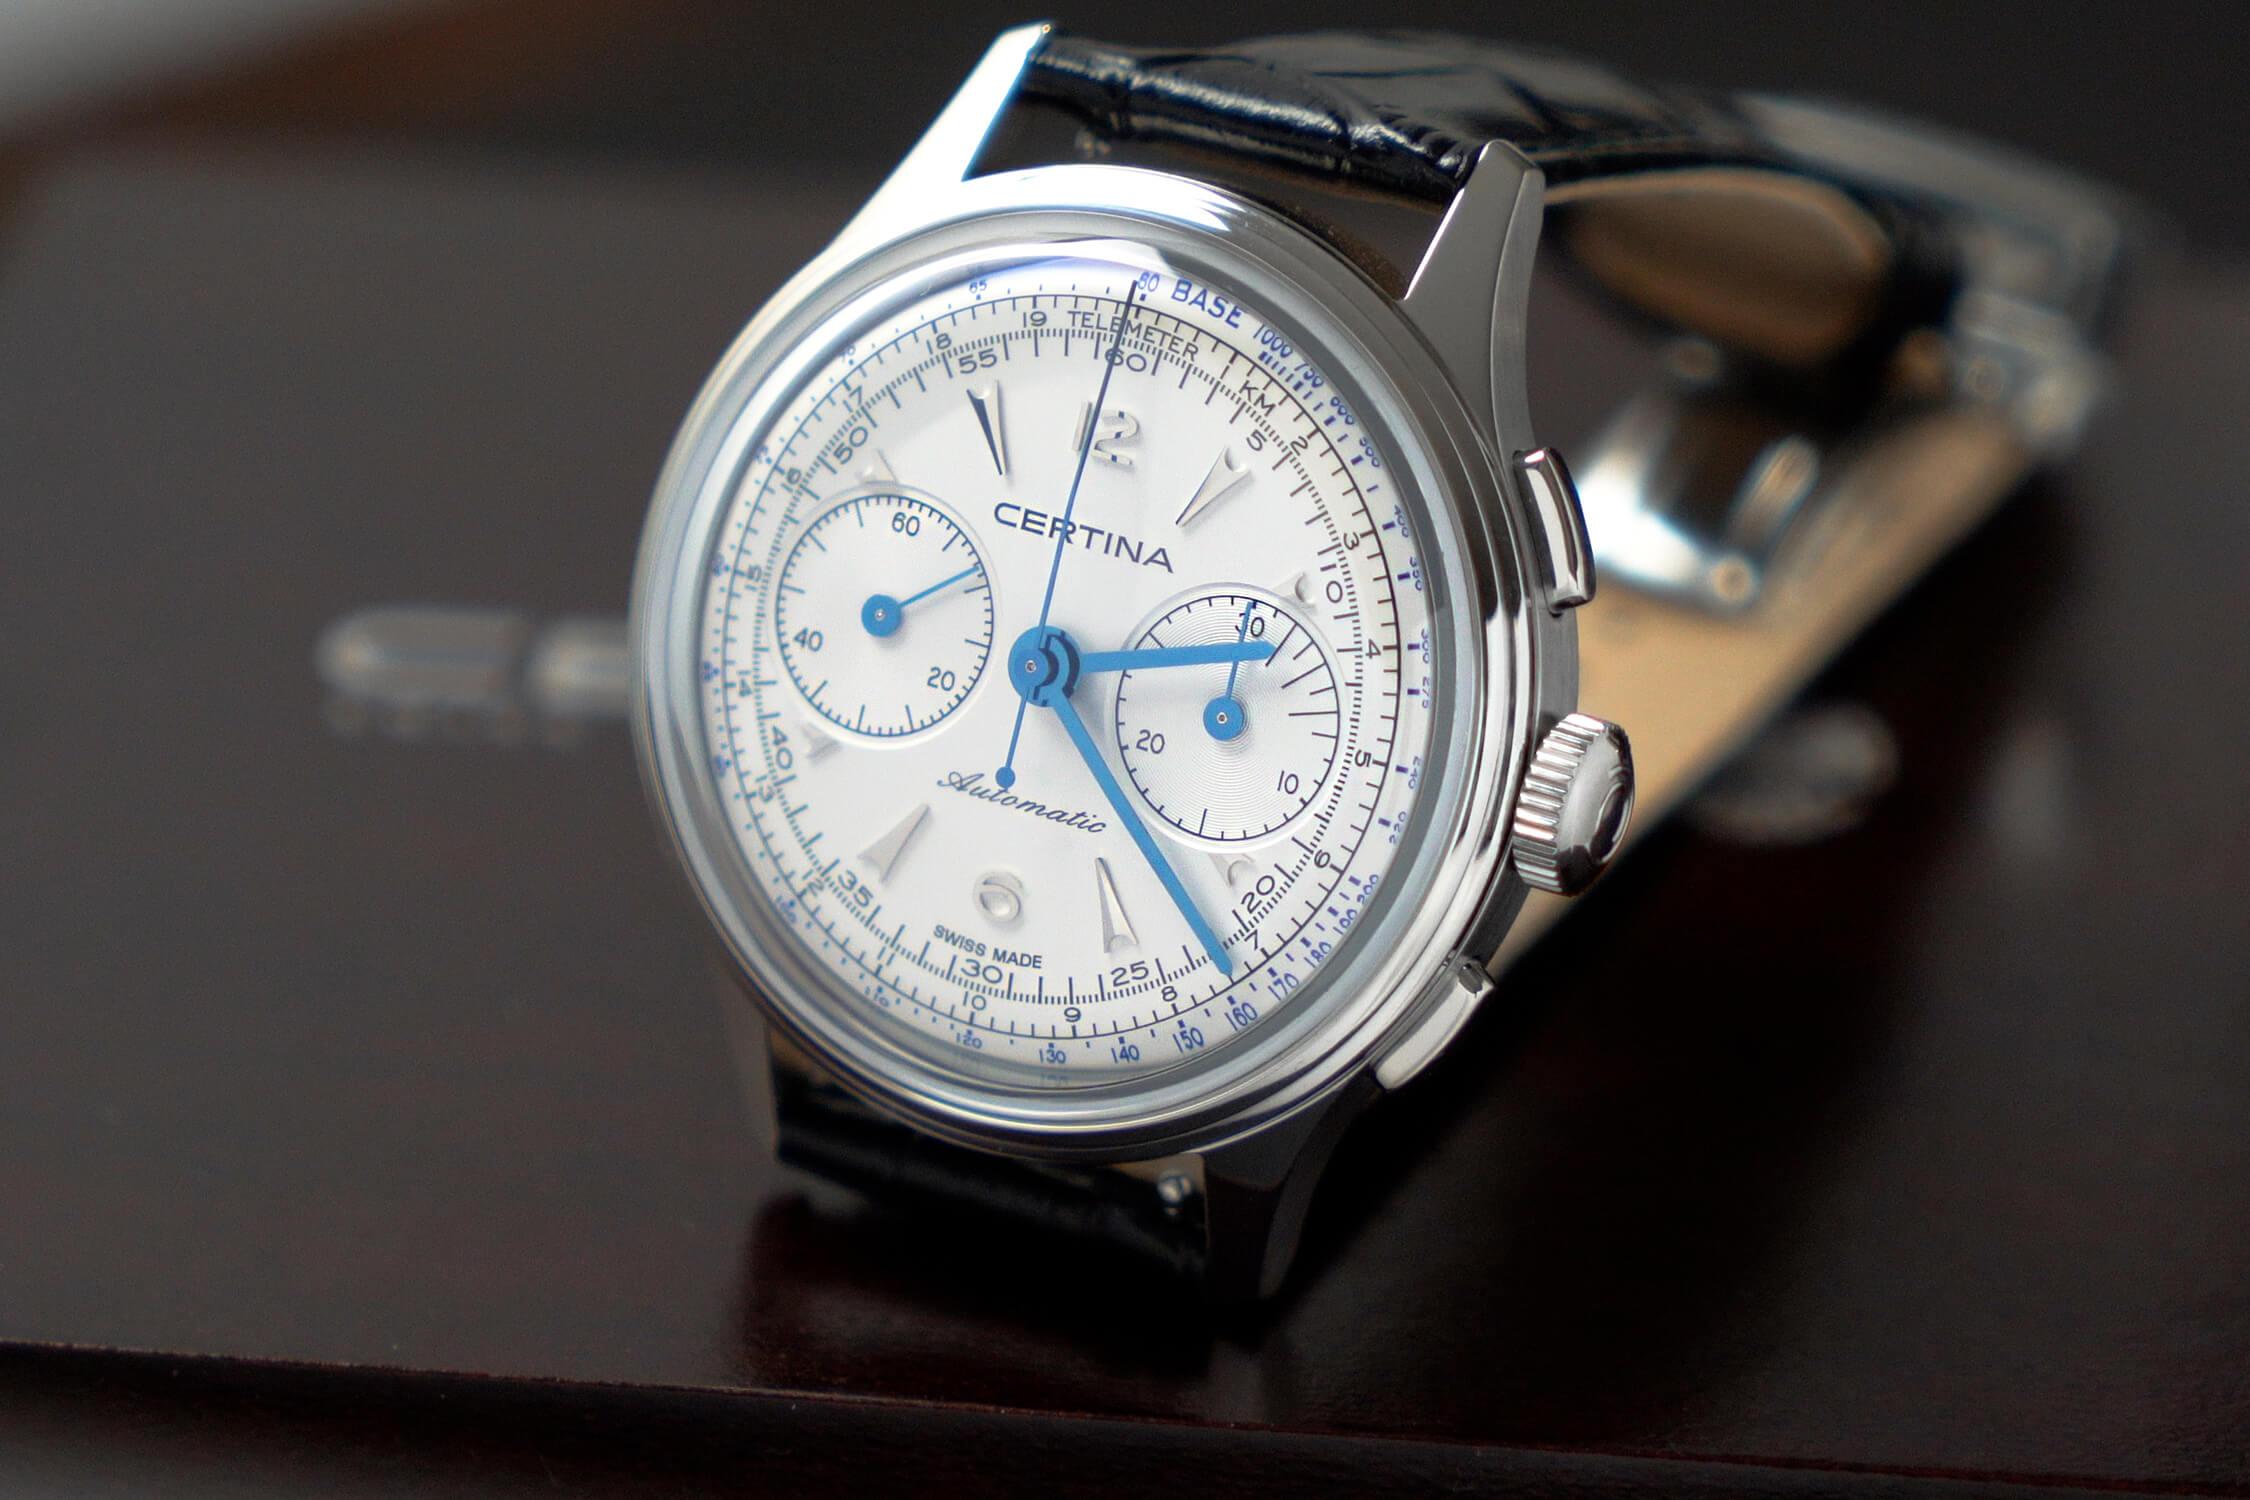 certina heritage ds chronograph-automatic C038.462.16.037.00